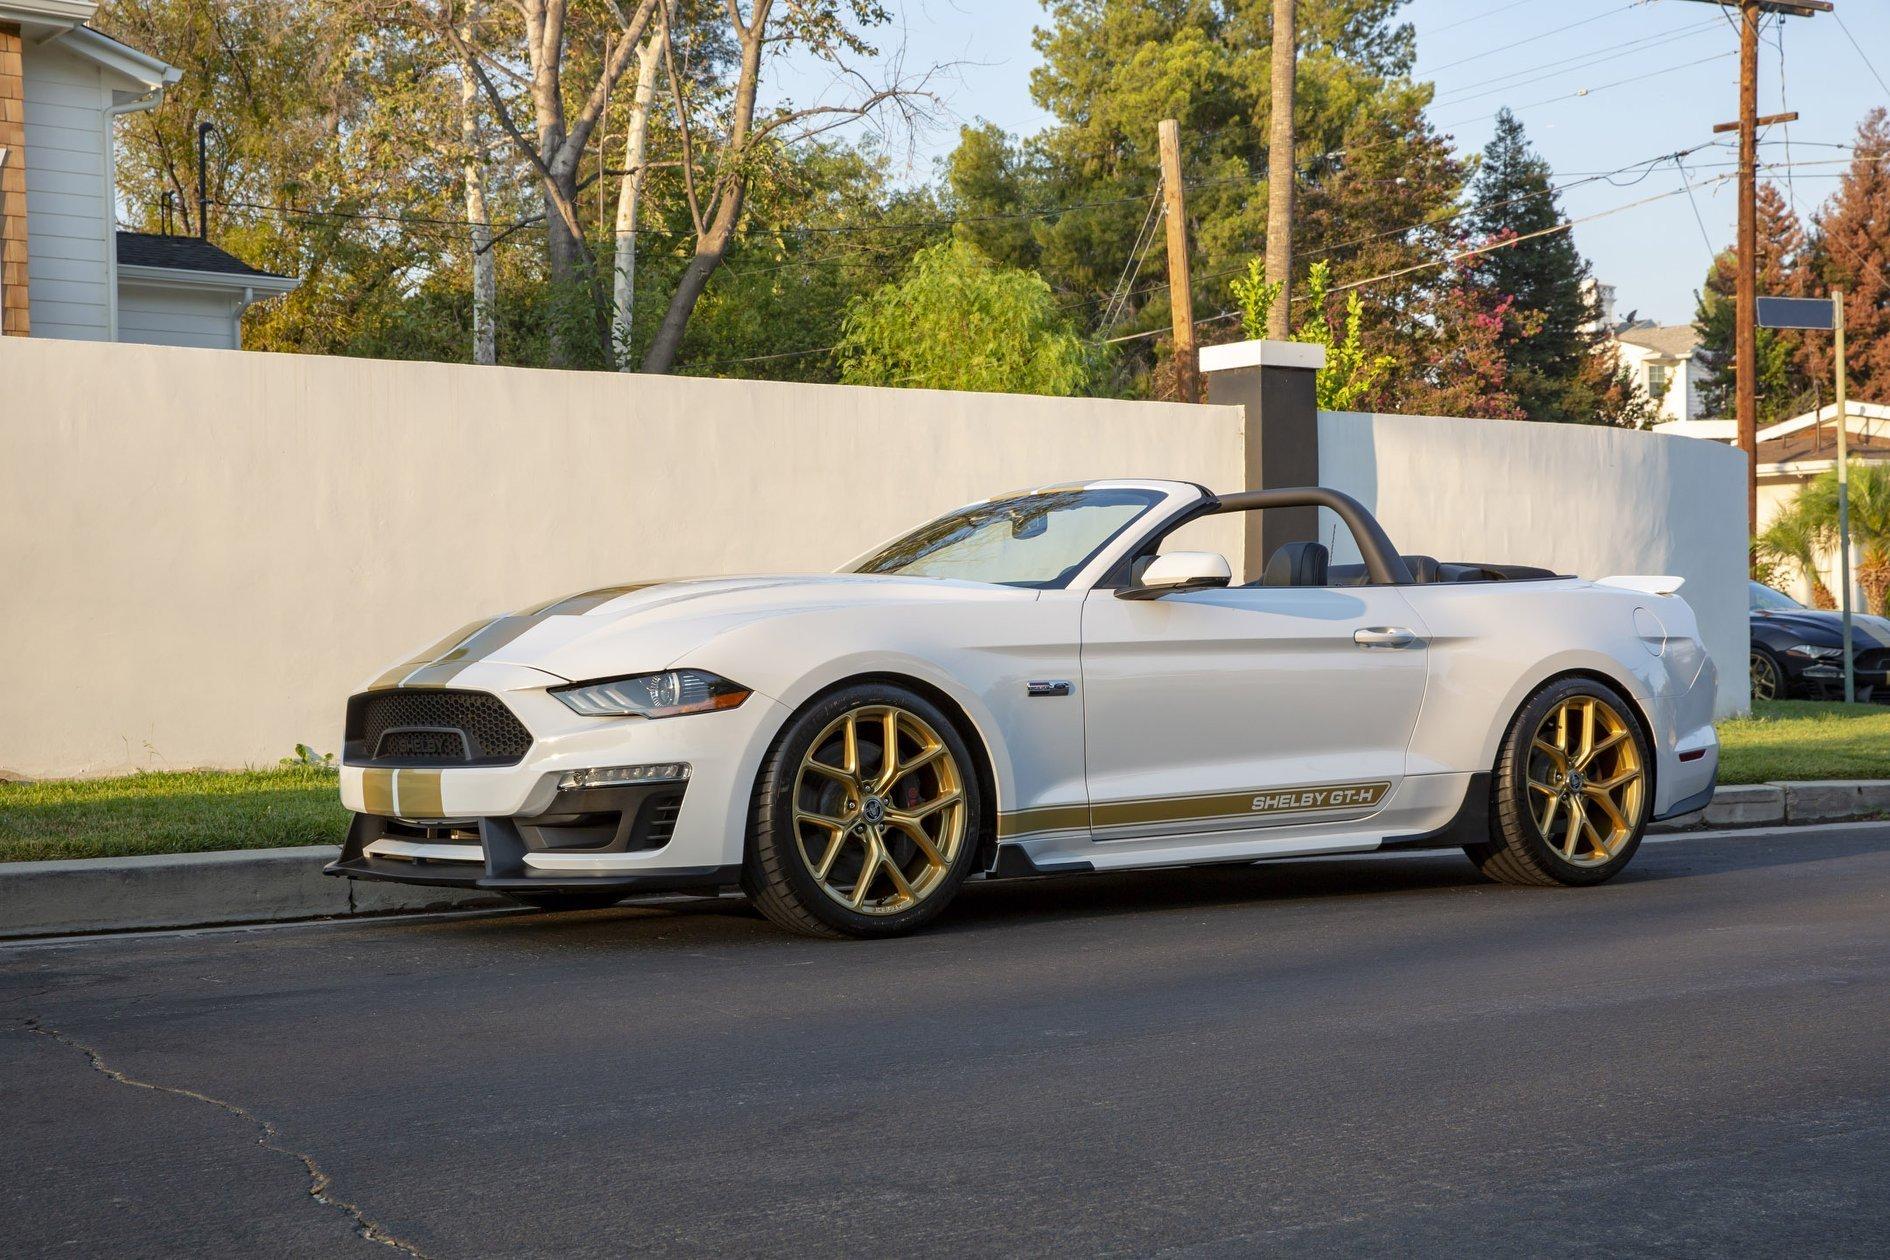 Shelby GT福特野马GT版本新颖黄色涂装